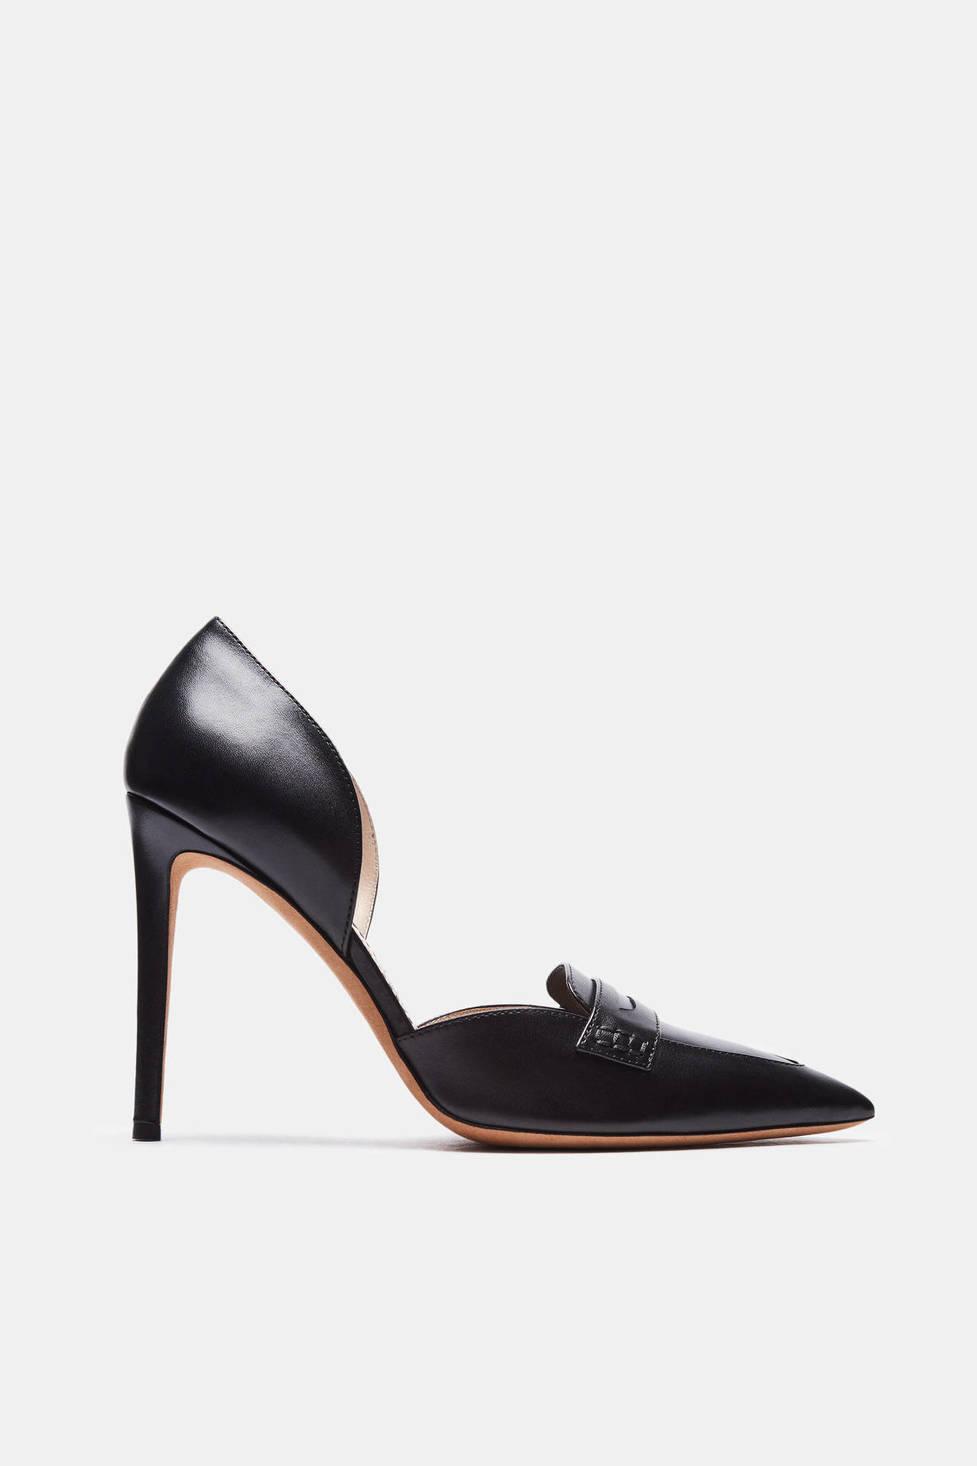 Altuzarra Bancroft D'Orsay Heel in Black $477